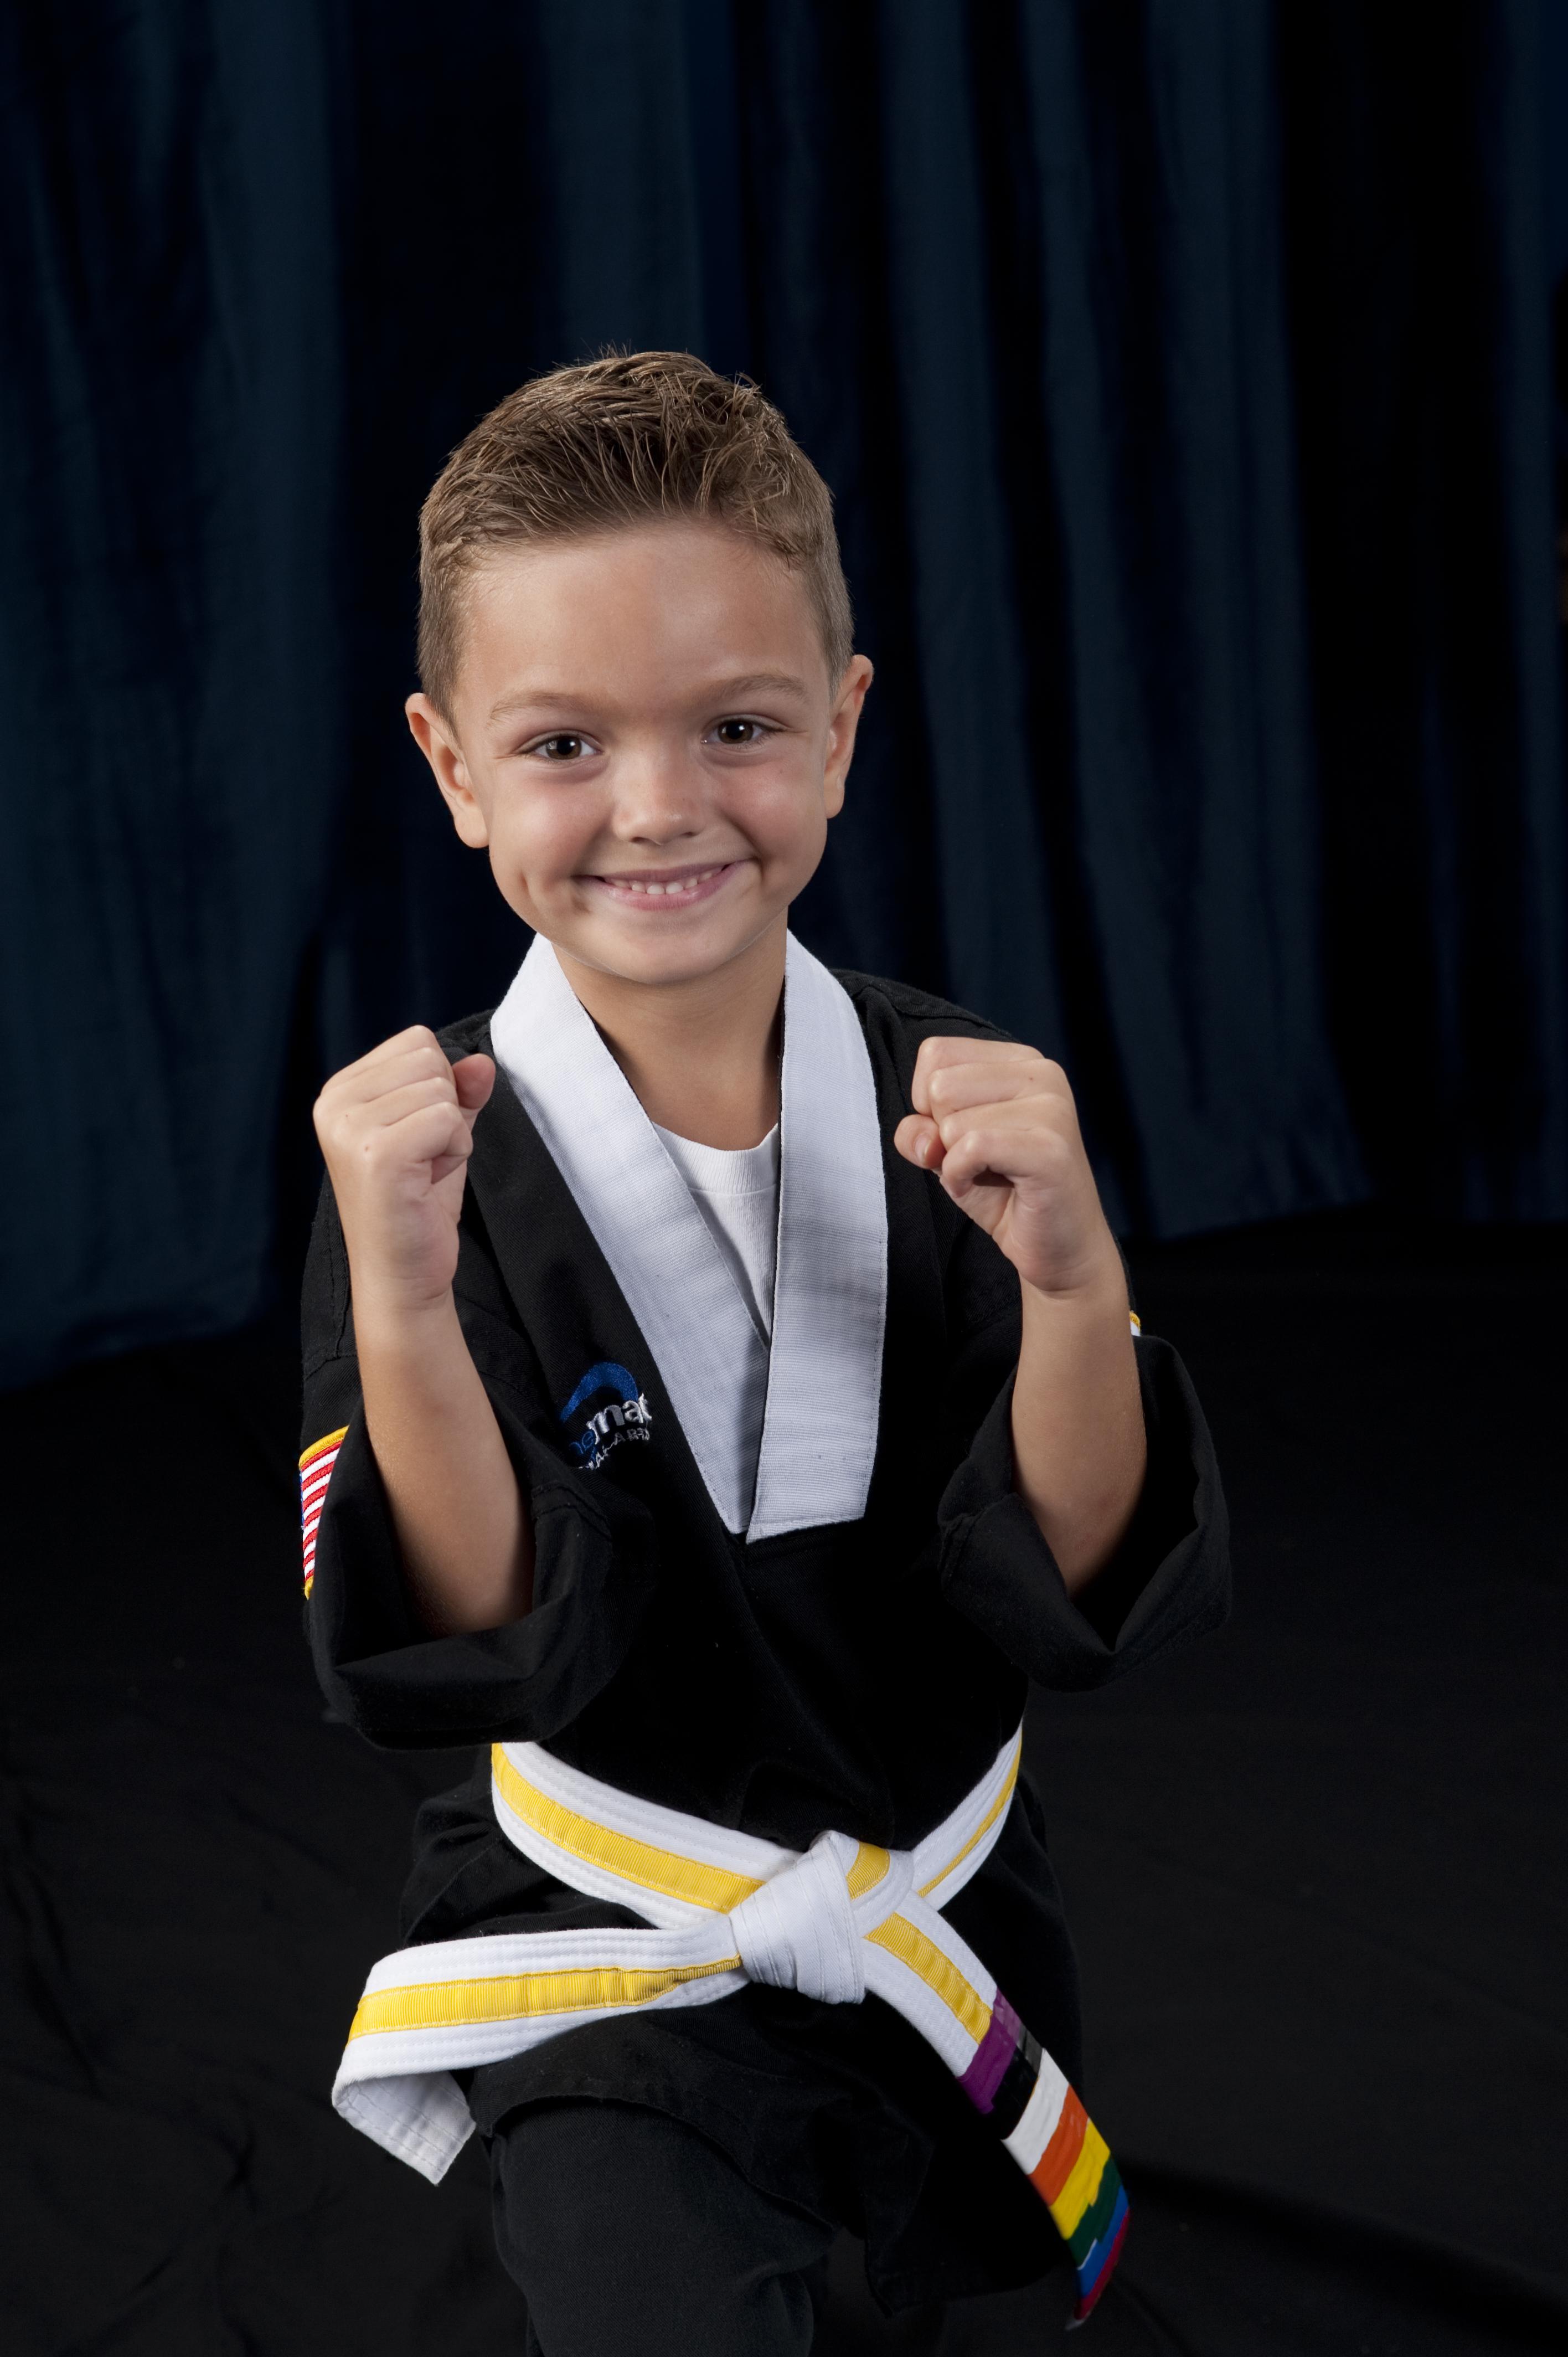 Basic SKILLZ 5-6 yr old martial arts program